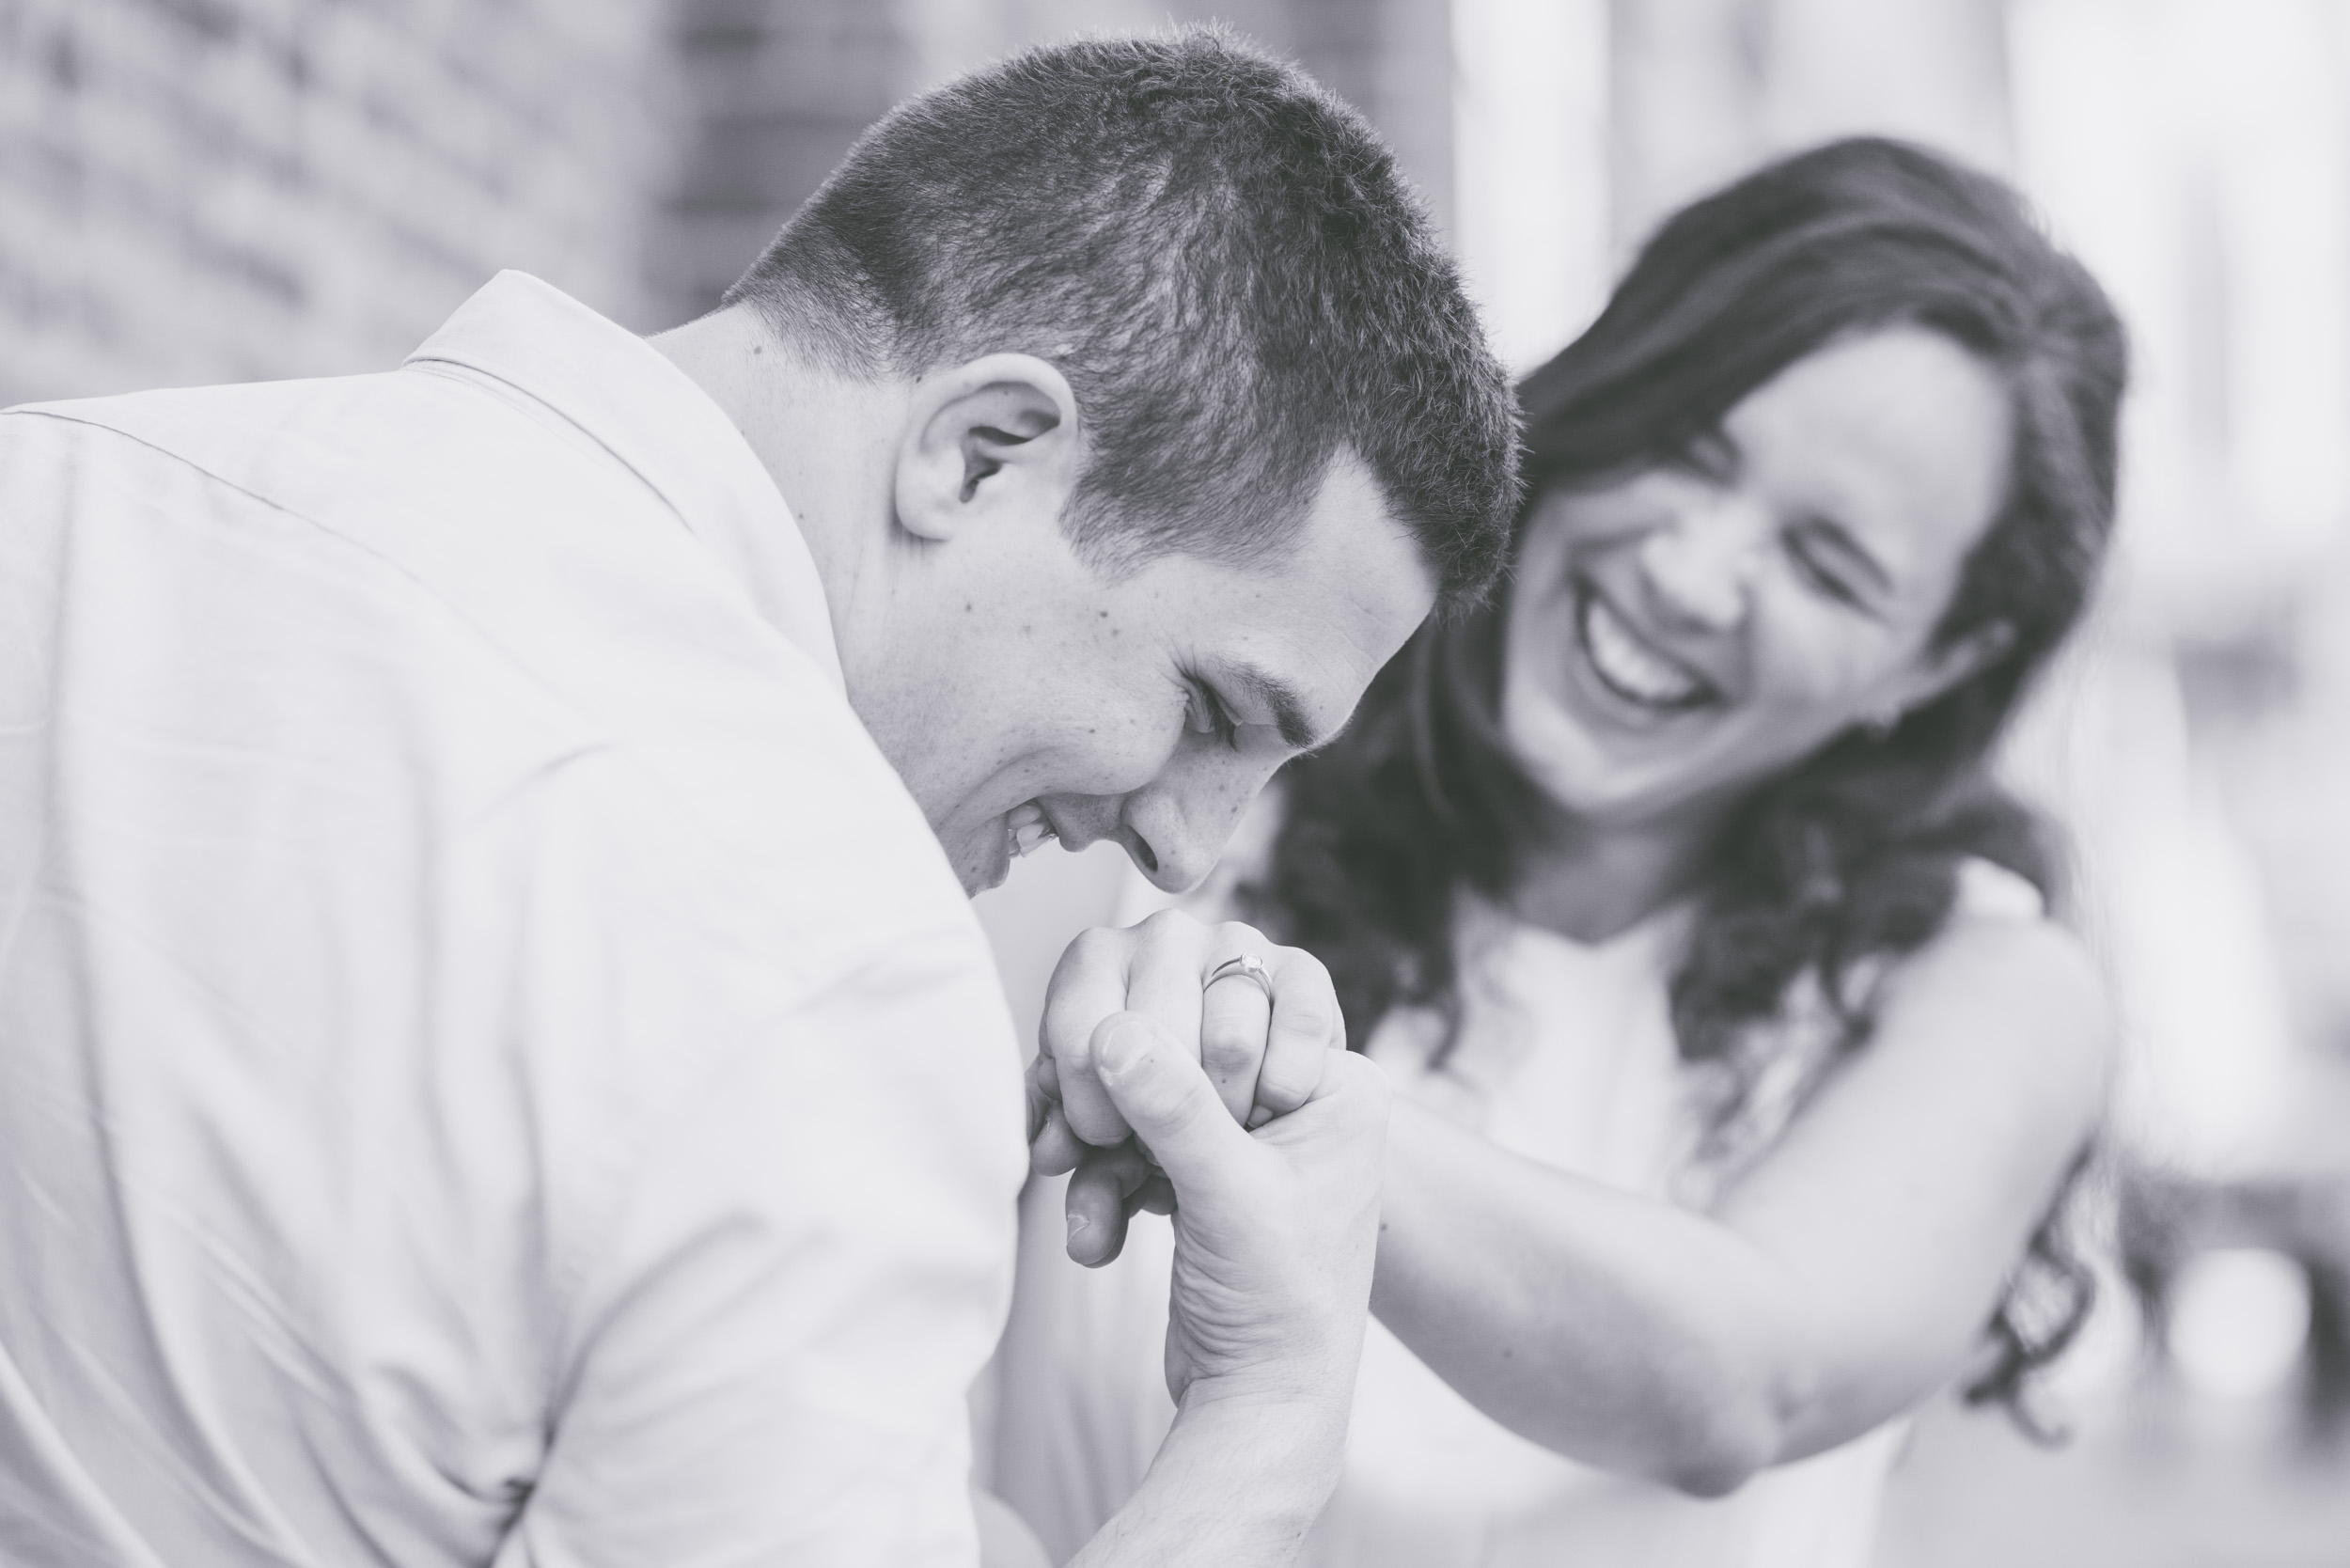 Laughing looking at ring - Engagement Portraits - Photo credit Nicola Bailey.jpg